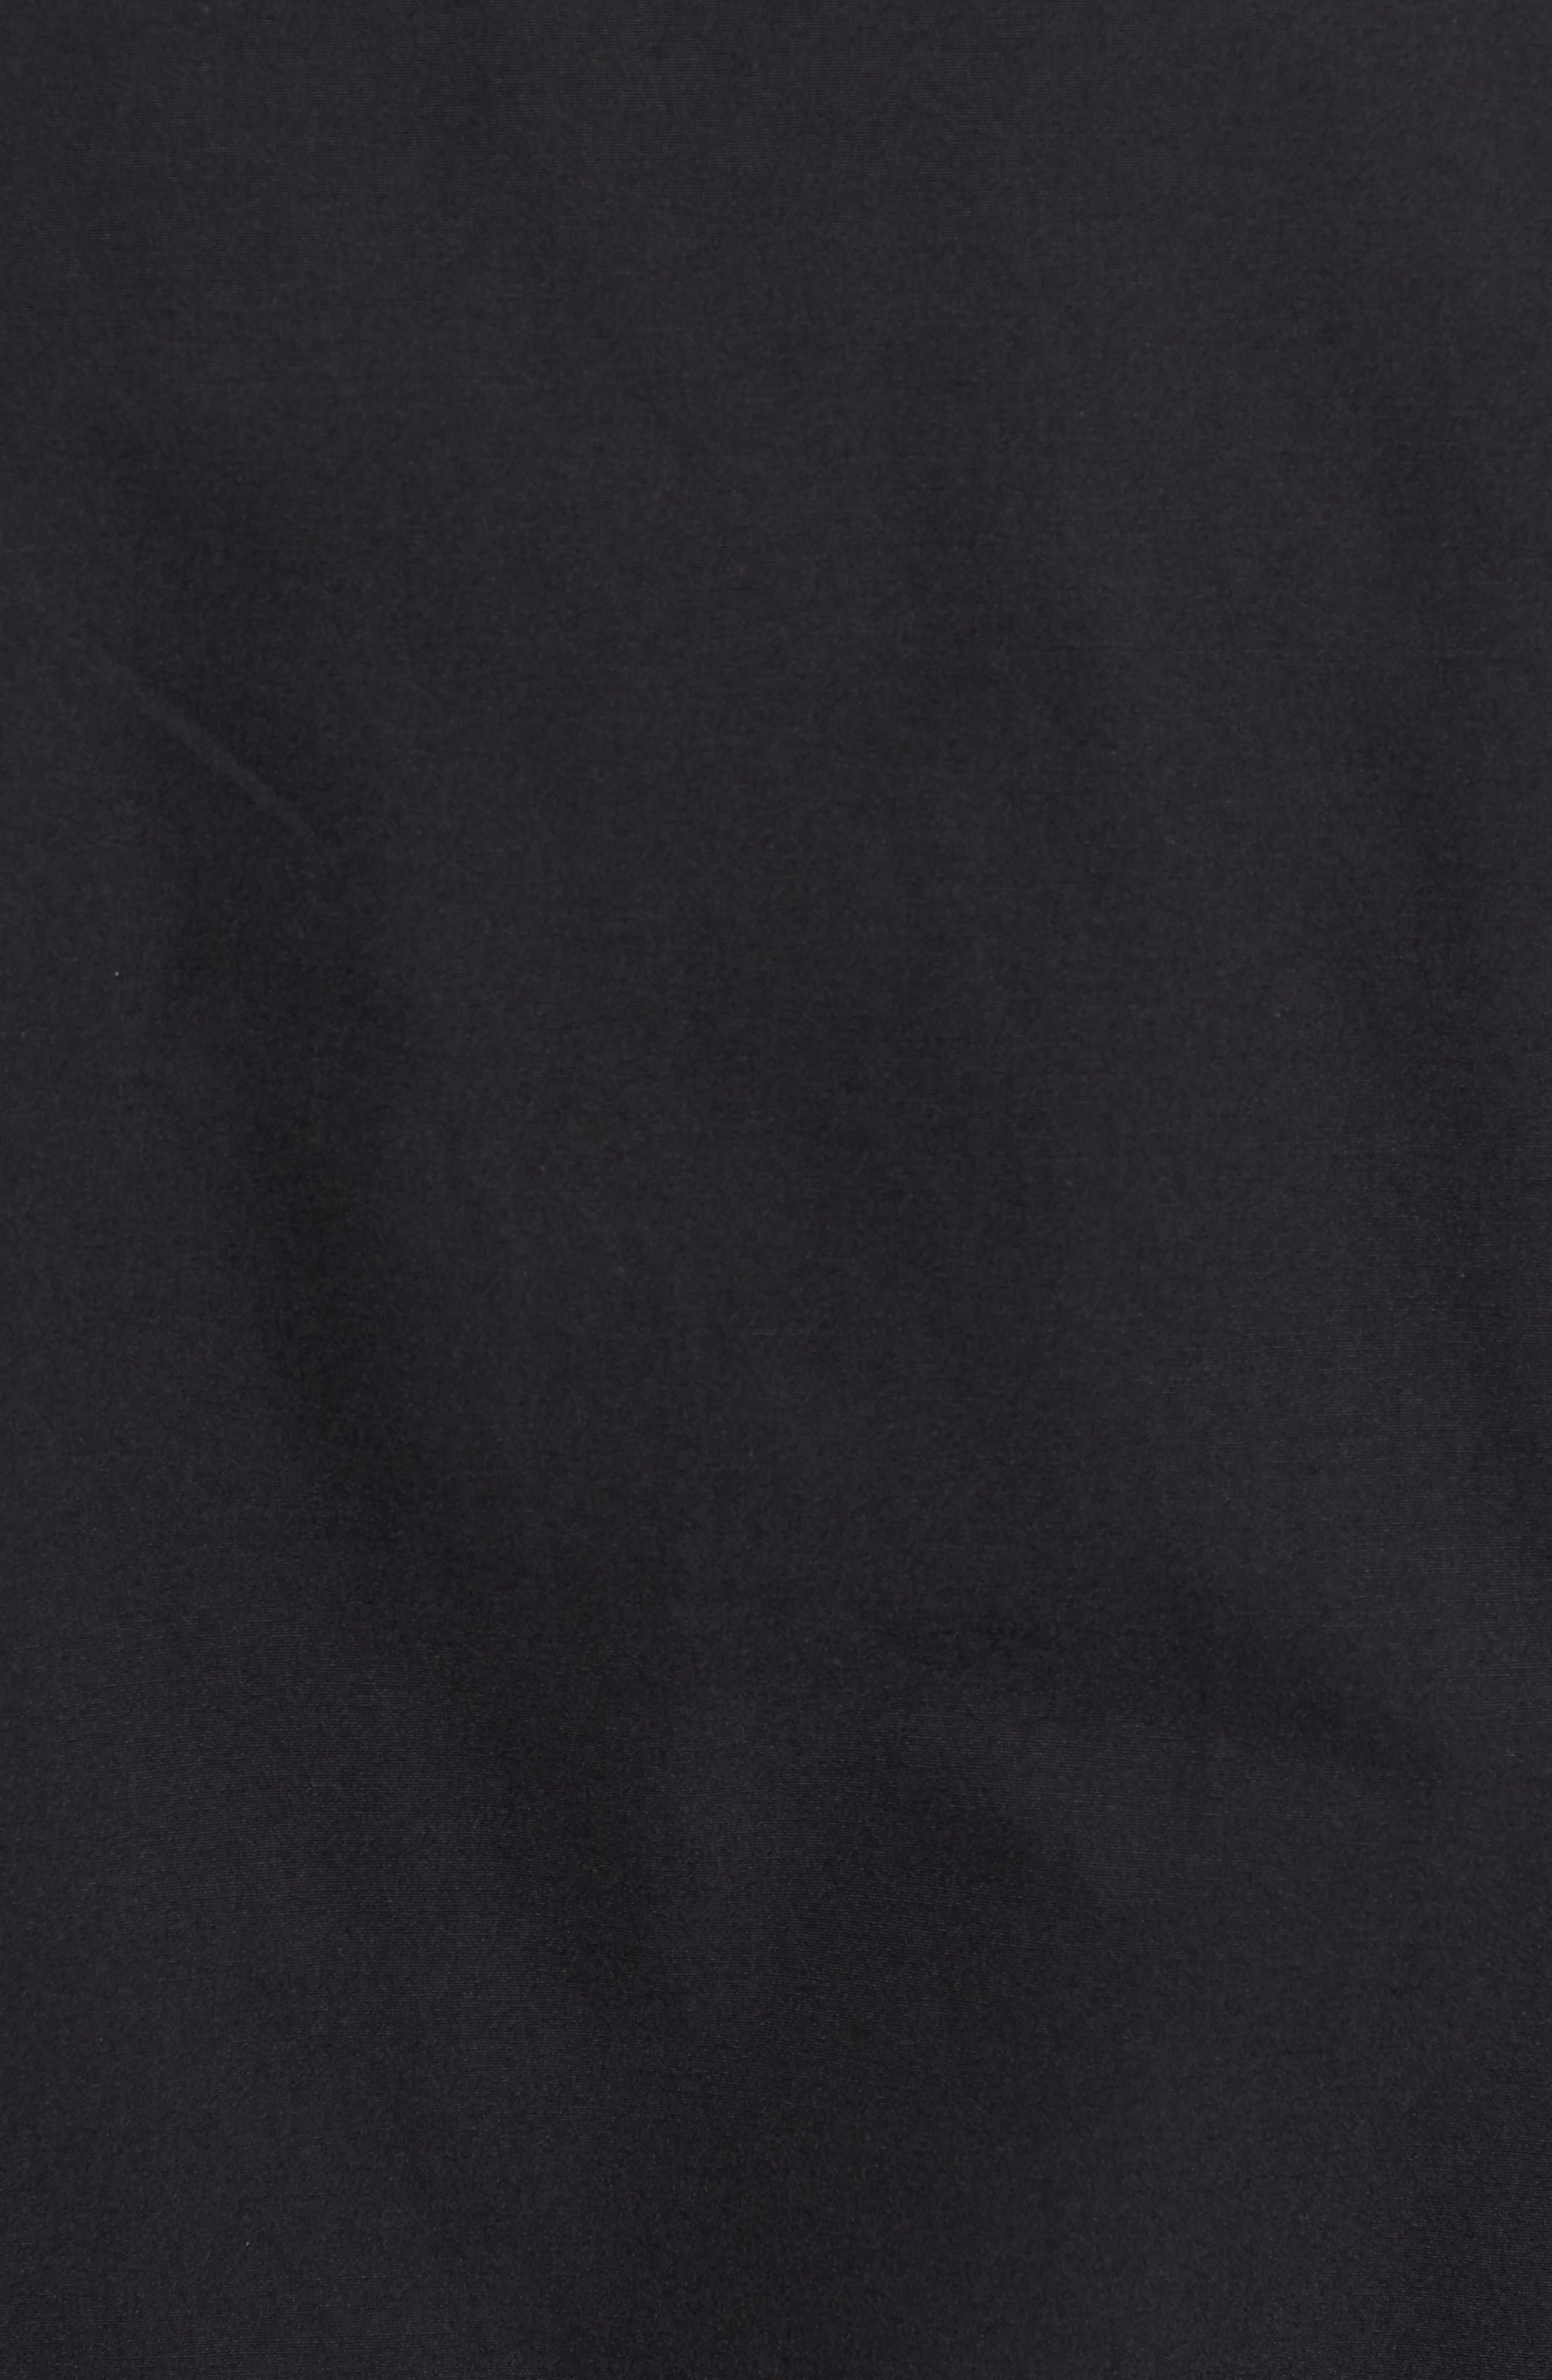 Varsity Jacket,                             Alternate thumbnail 6, color,                             Black/ Shadow